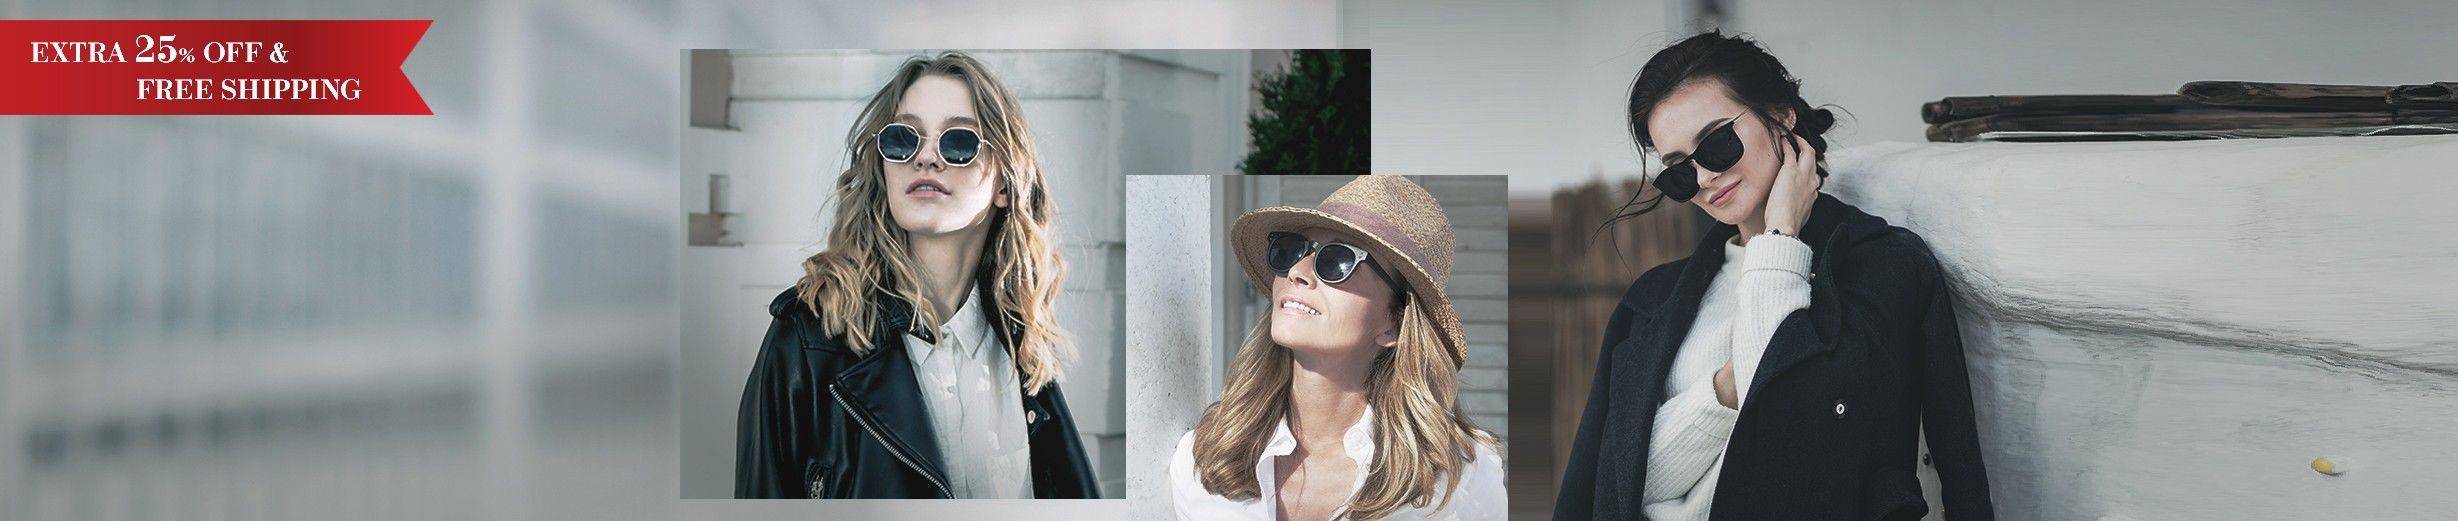 Glassesgallery - Woman sunglasses banner